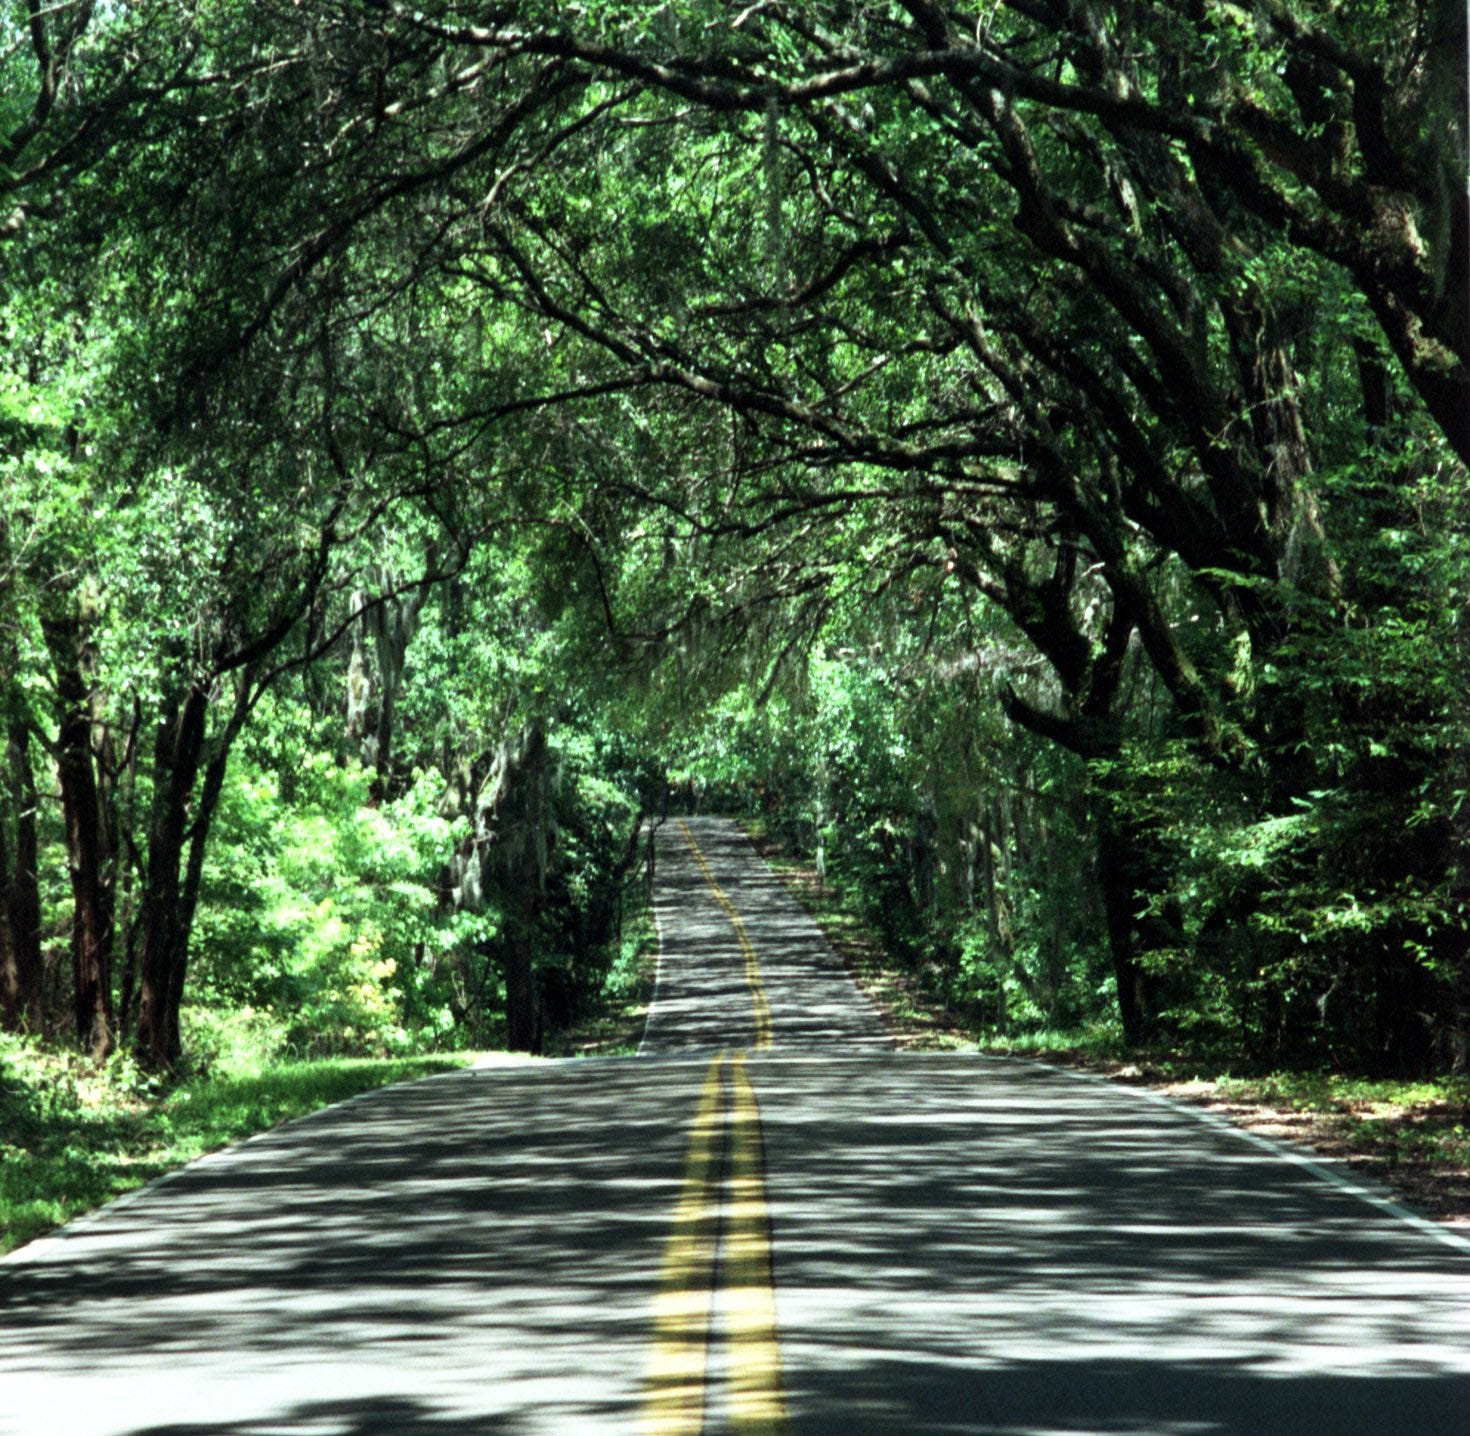 & Canopy Roads committee fears u0027sunsetu0027